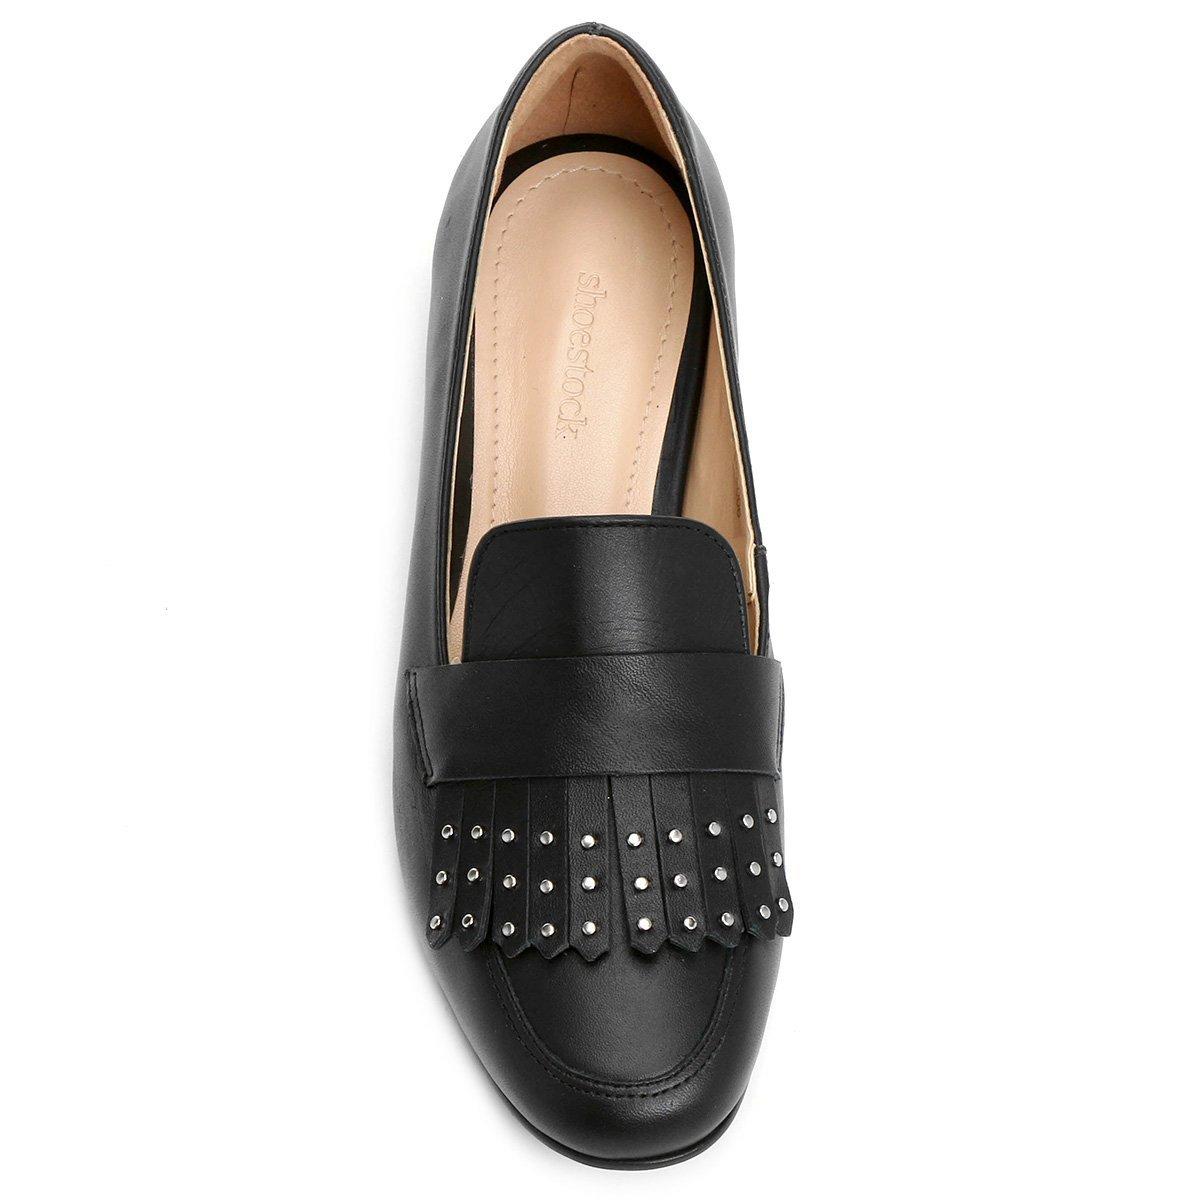 Shoestock Mocassim Couro Preto Couro Mocassim Feminina Apliques Franja ZtqdxaxnT